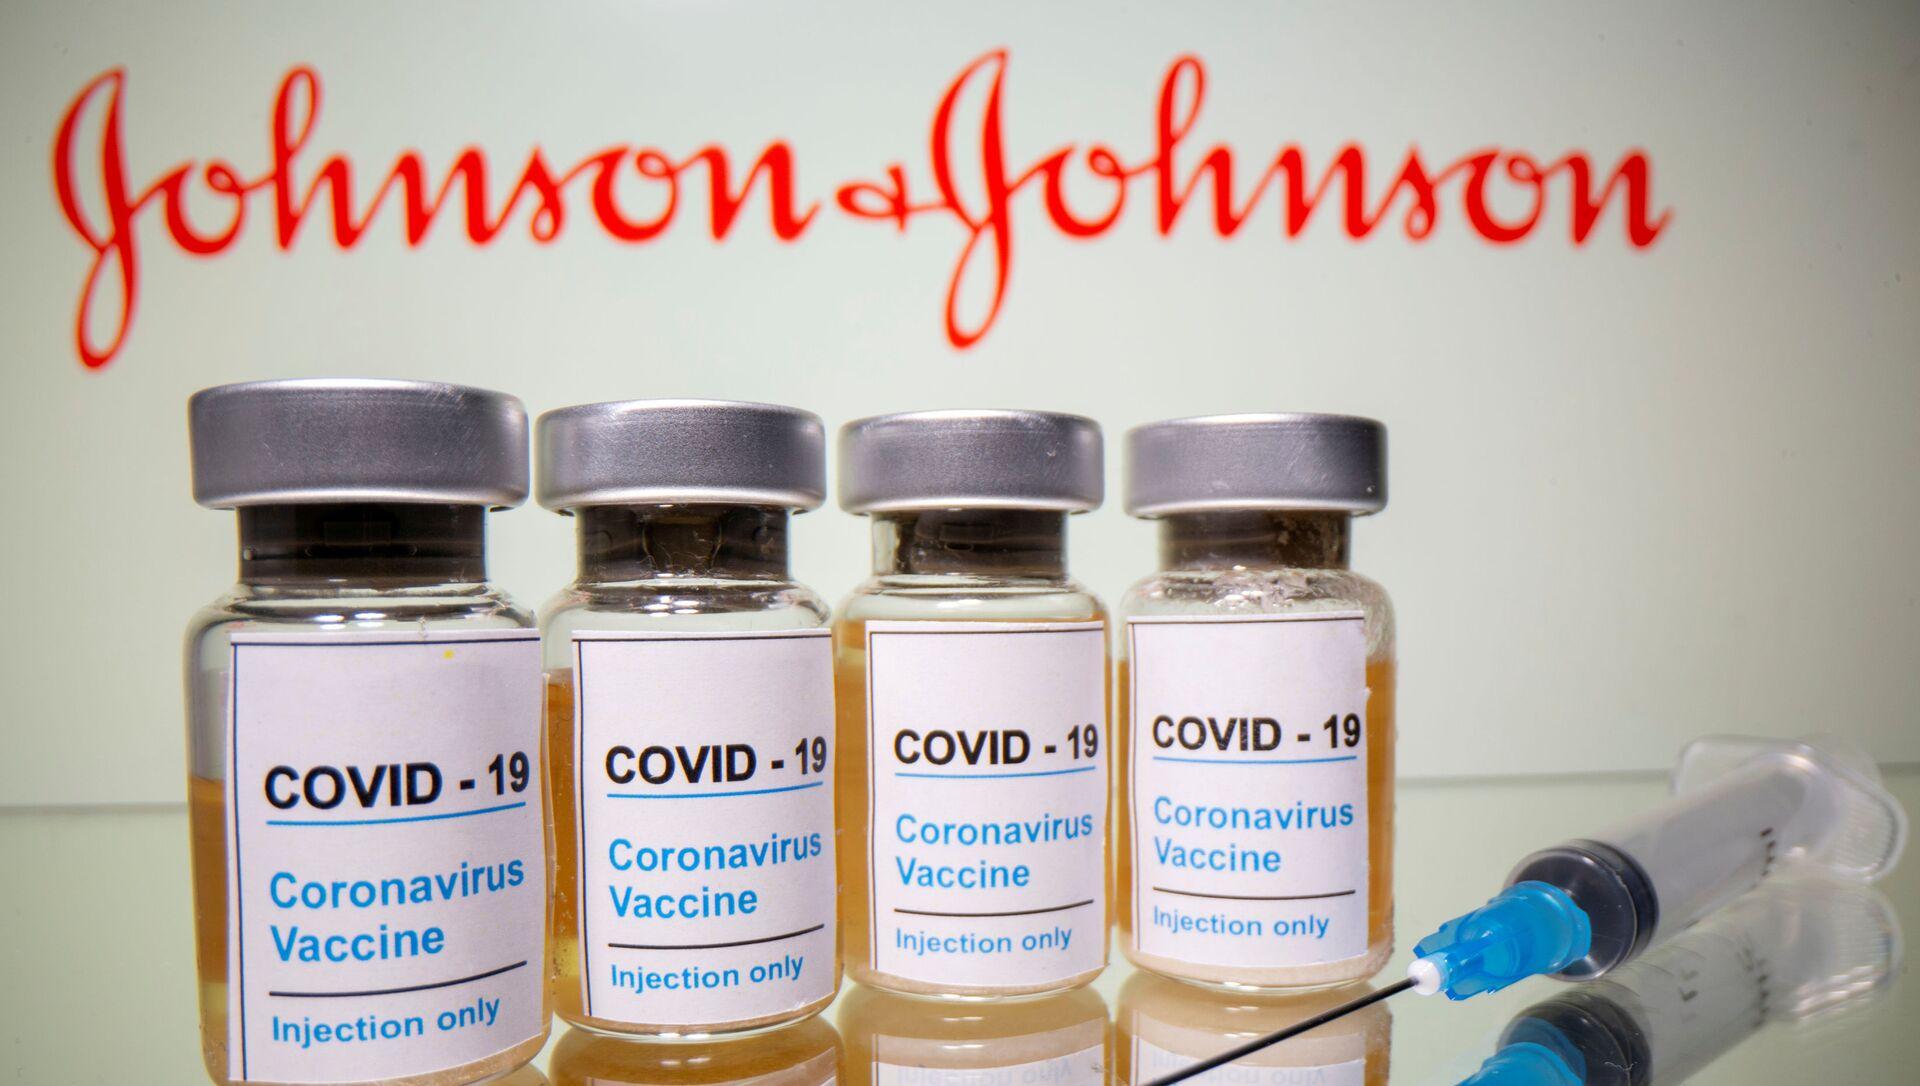 Вакцина и логотип компании Johnson & Johnson - Sputnik Italia, 1920, 26.02.2021